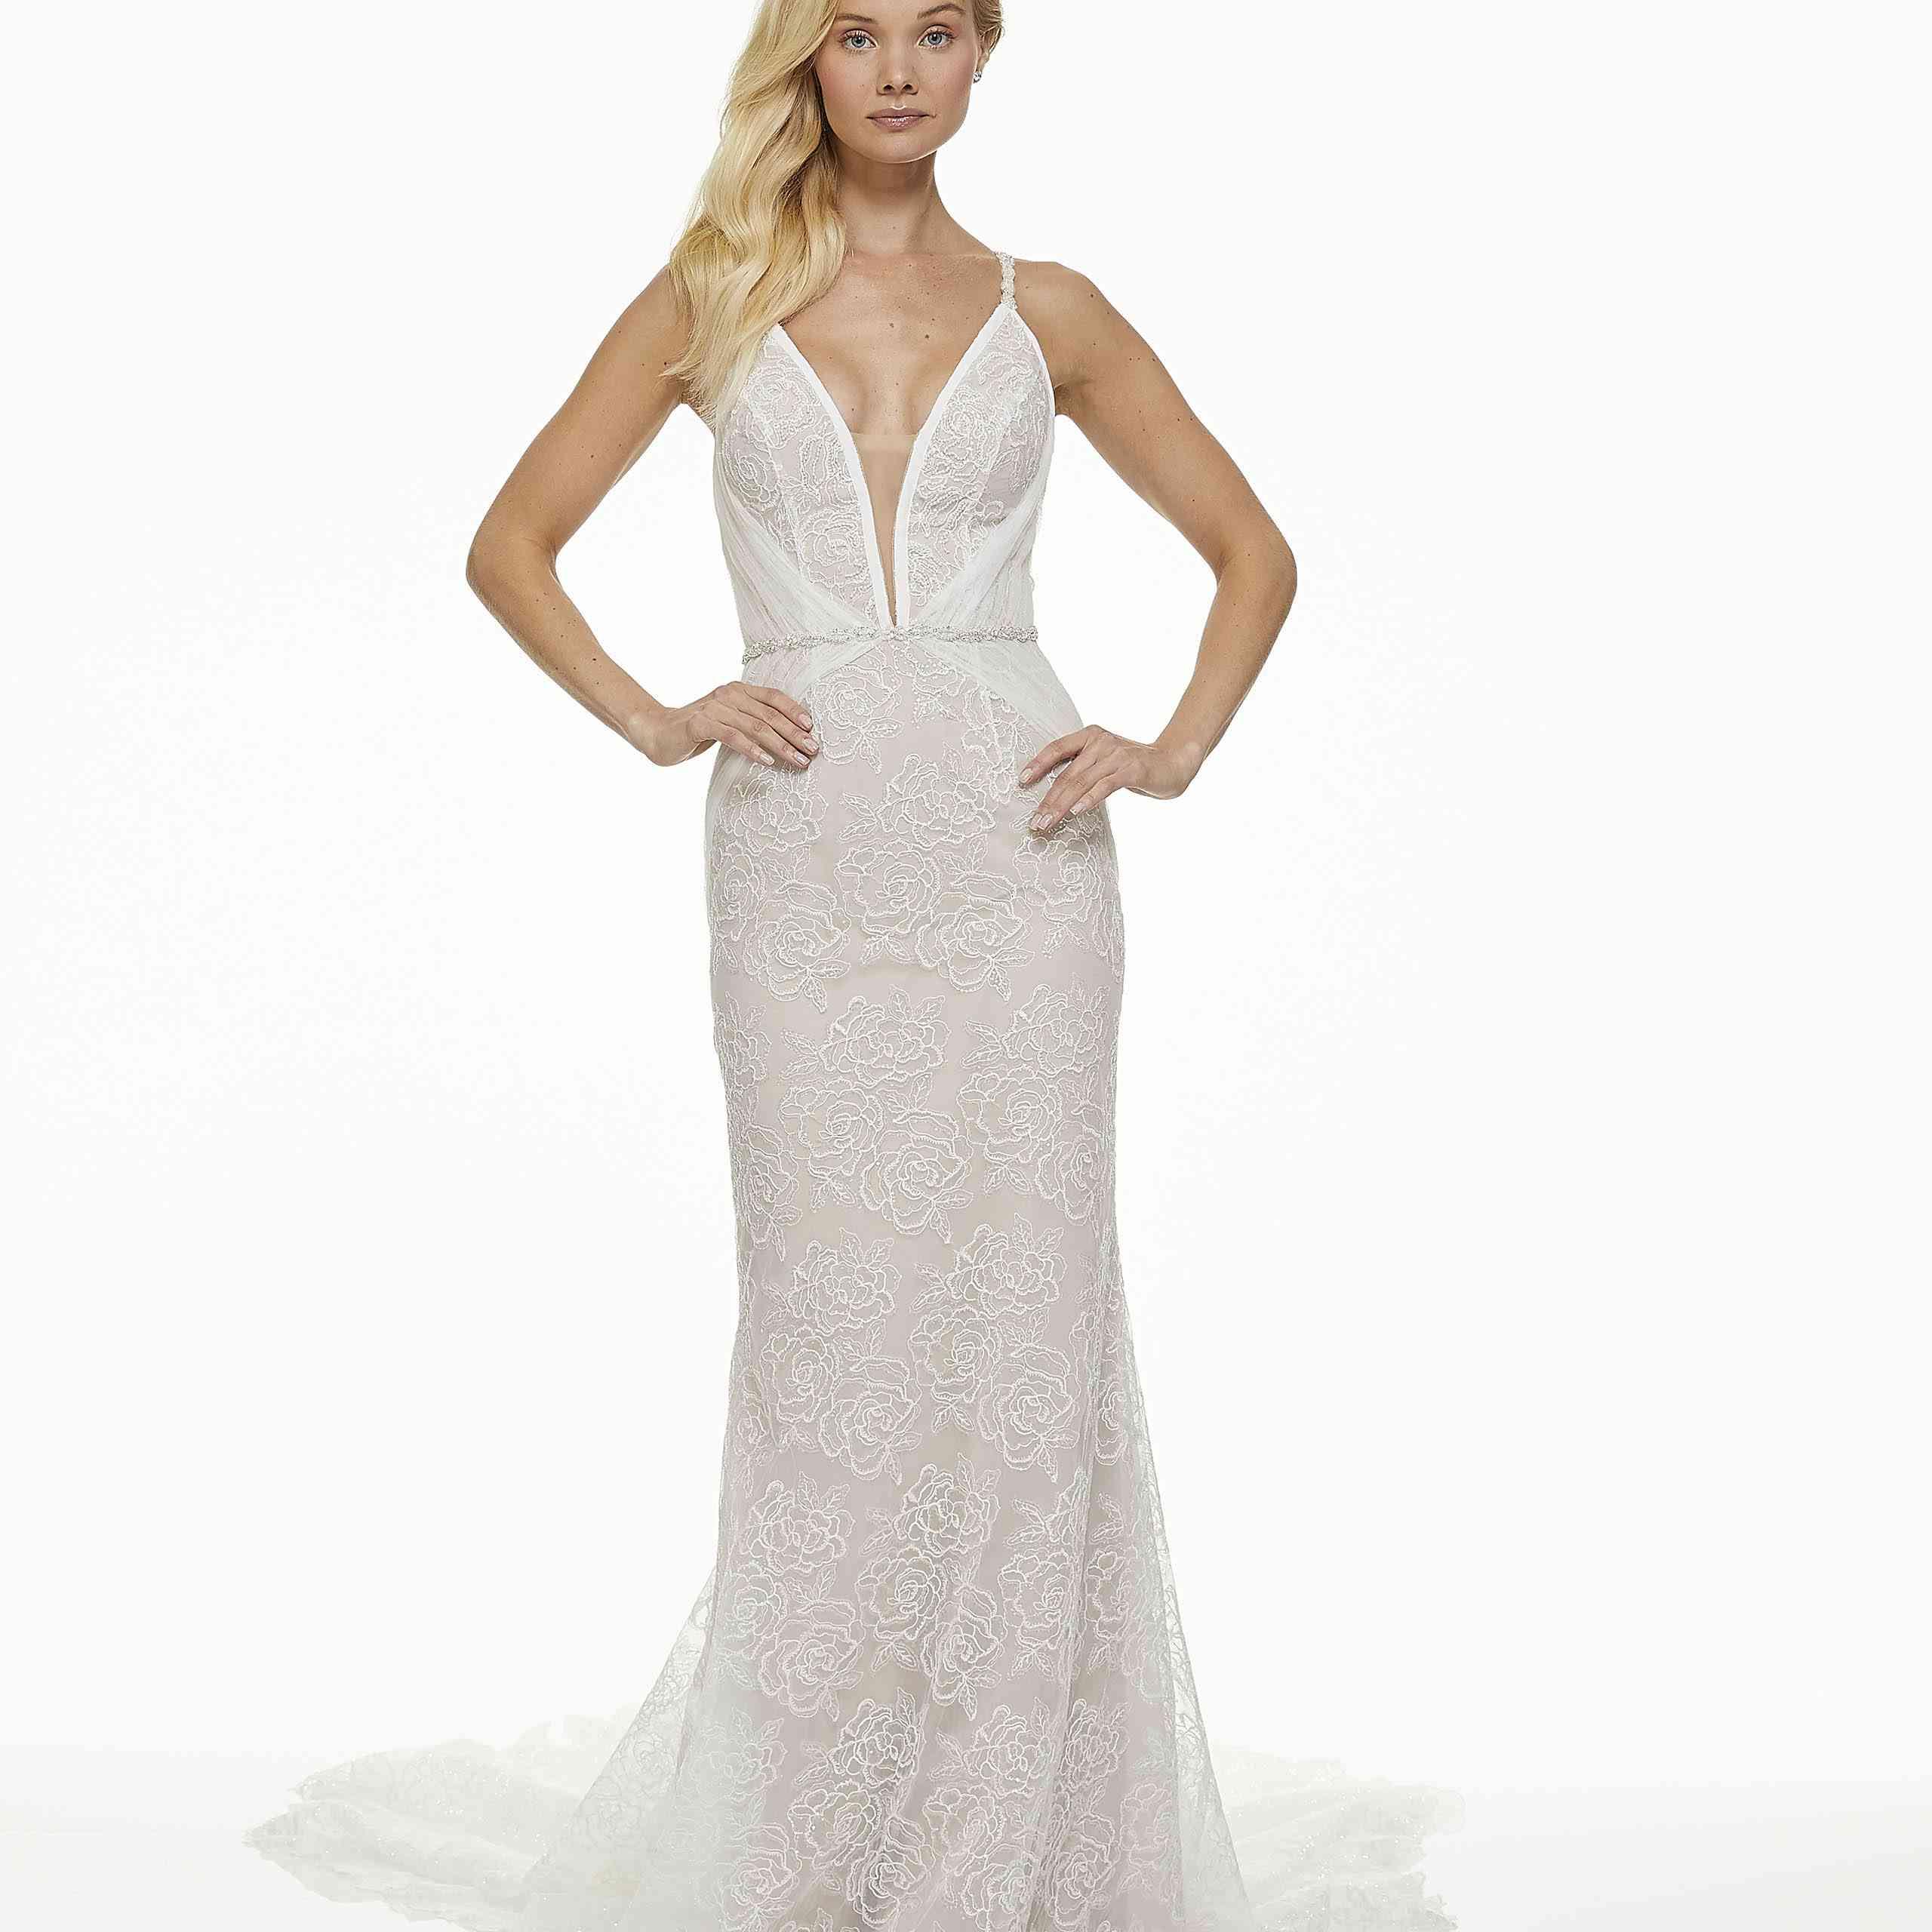 Model in plunging neckline wedding dress